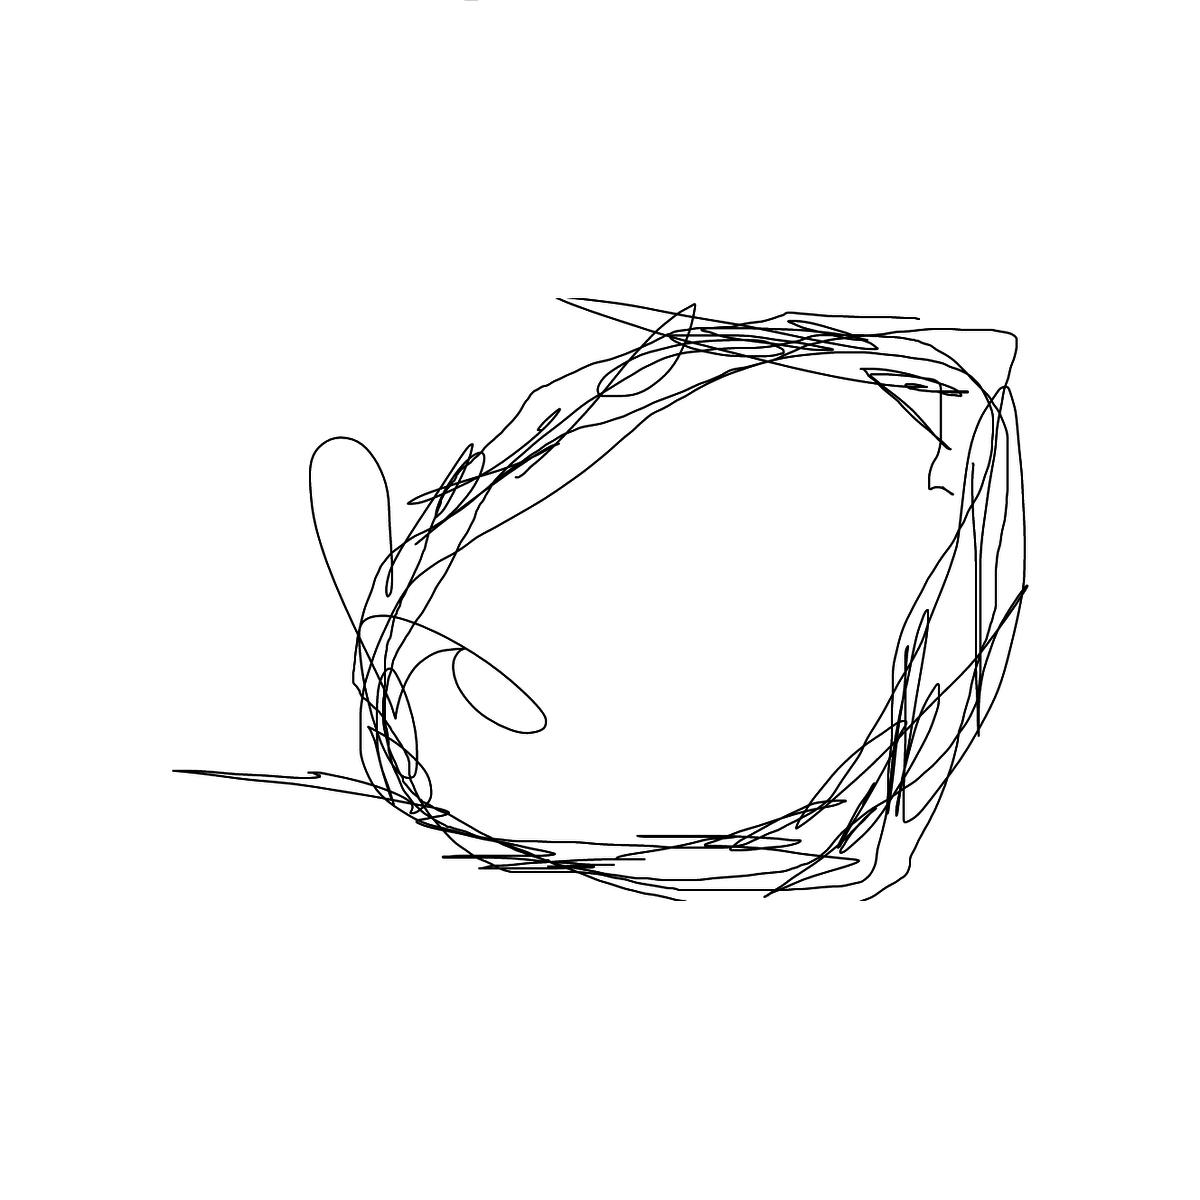 BAAAM drawing#20559 lat:40.7116050720214840lng: -74.0091552734375000